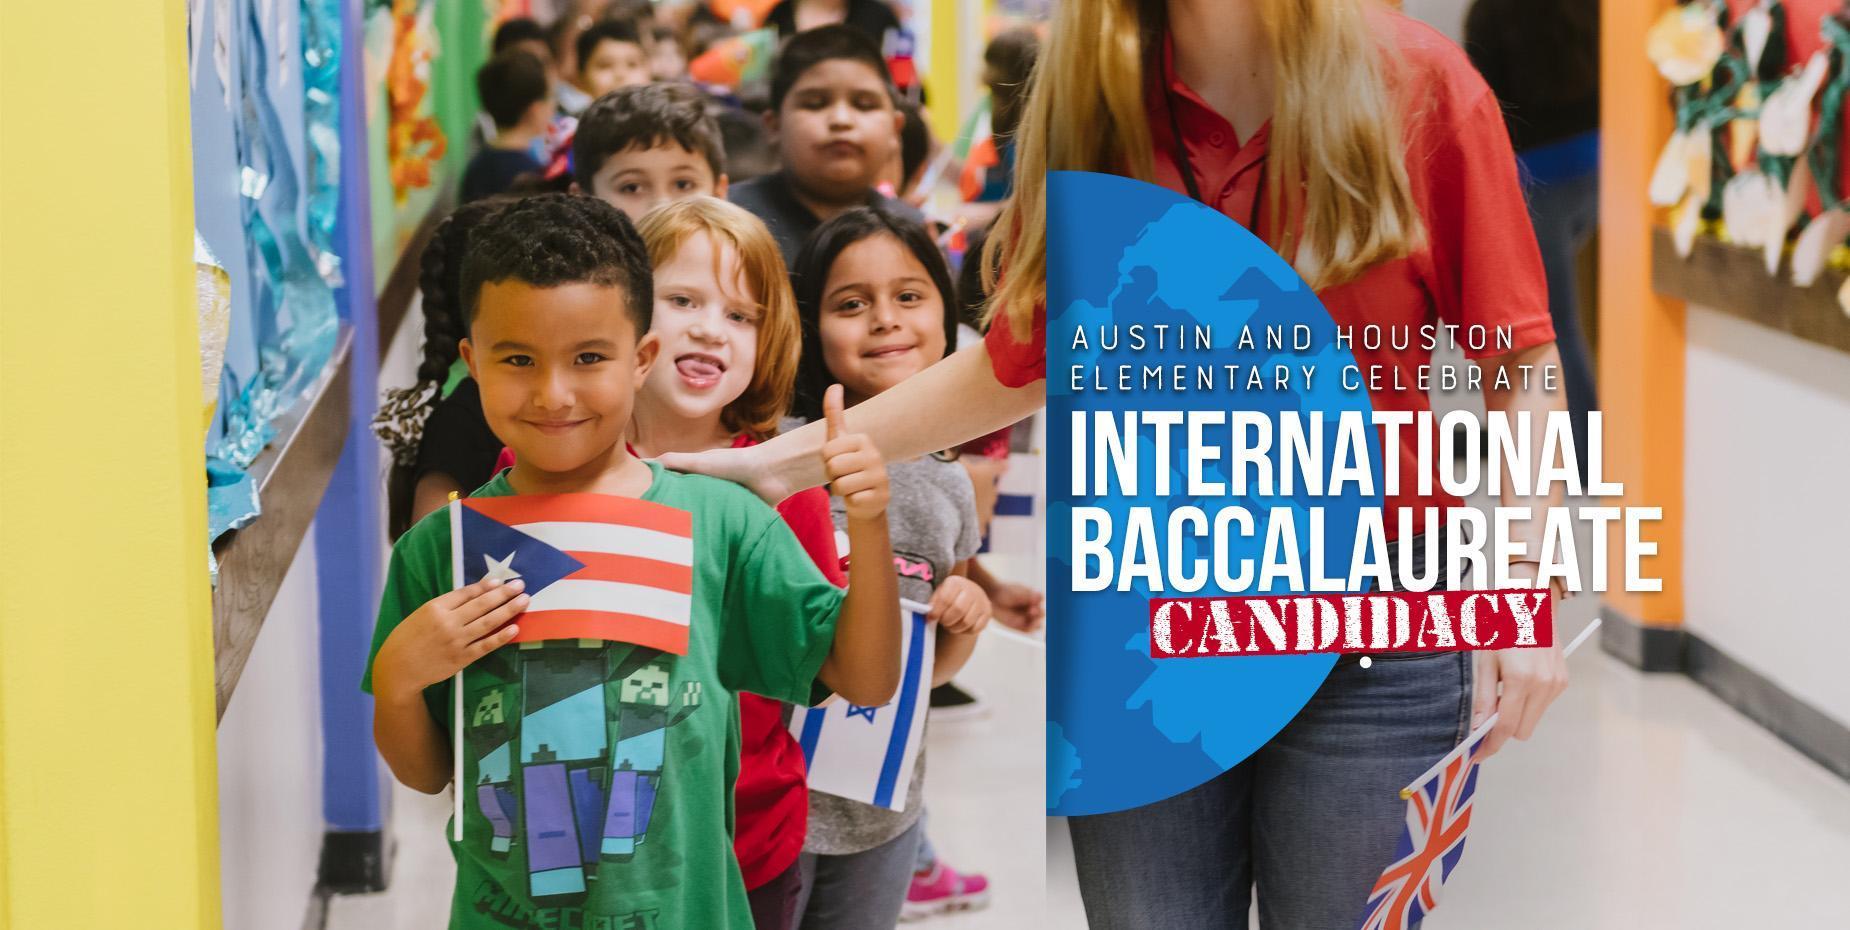 Austin and Houston Elementary celebrate International Baccalaureate candidacy